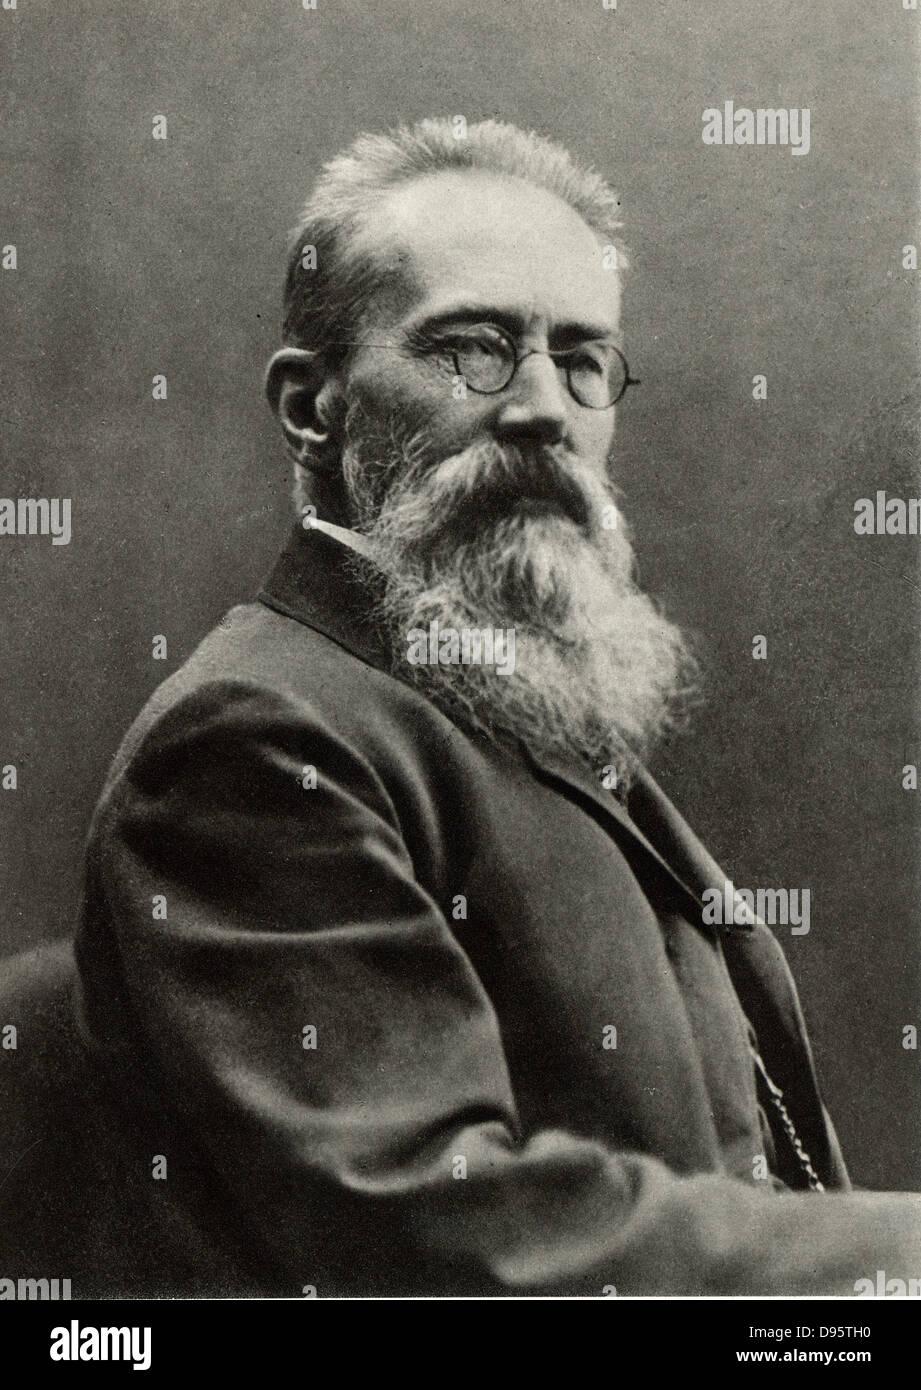 Nikolay Andreievich Rimsky-Korsakov (1844-1908) Russian composer. After a photograph. - Stock Image